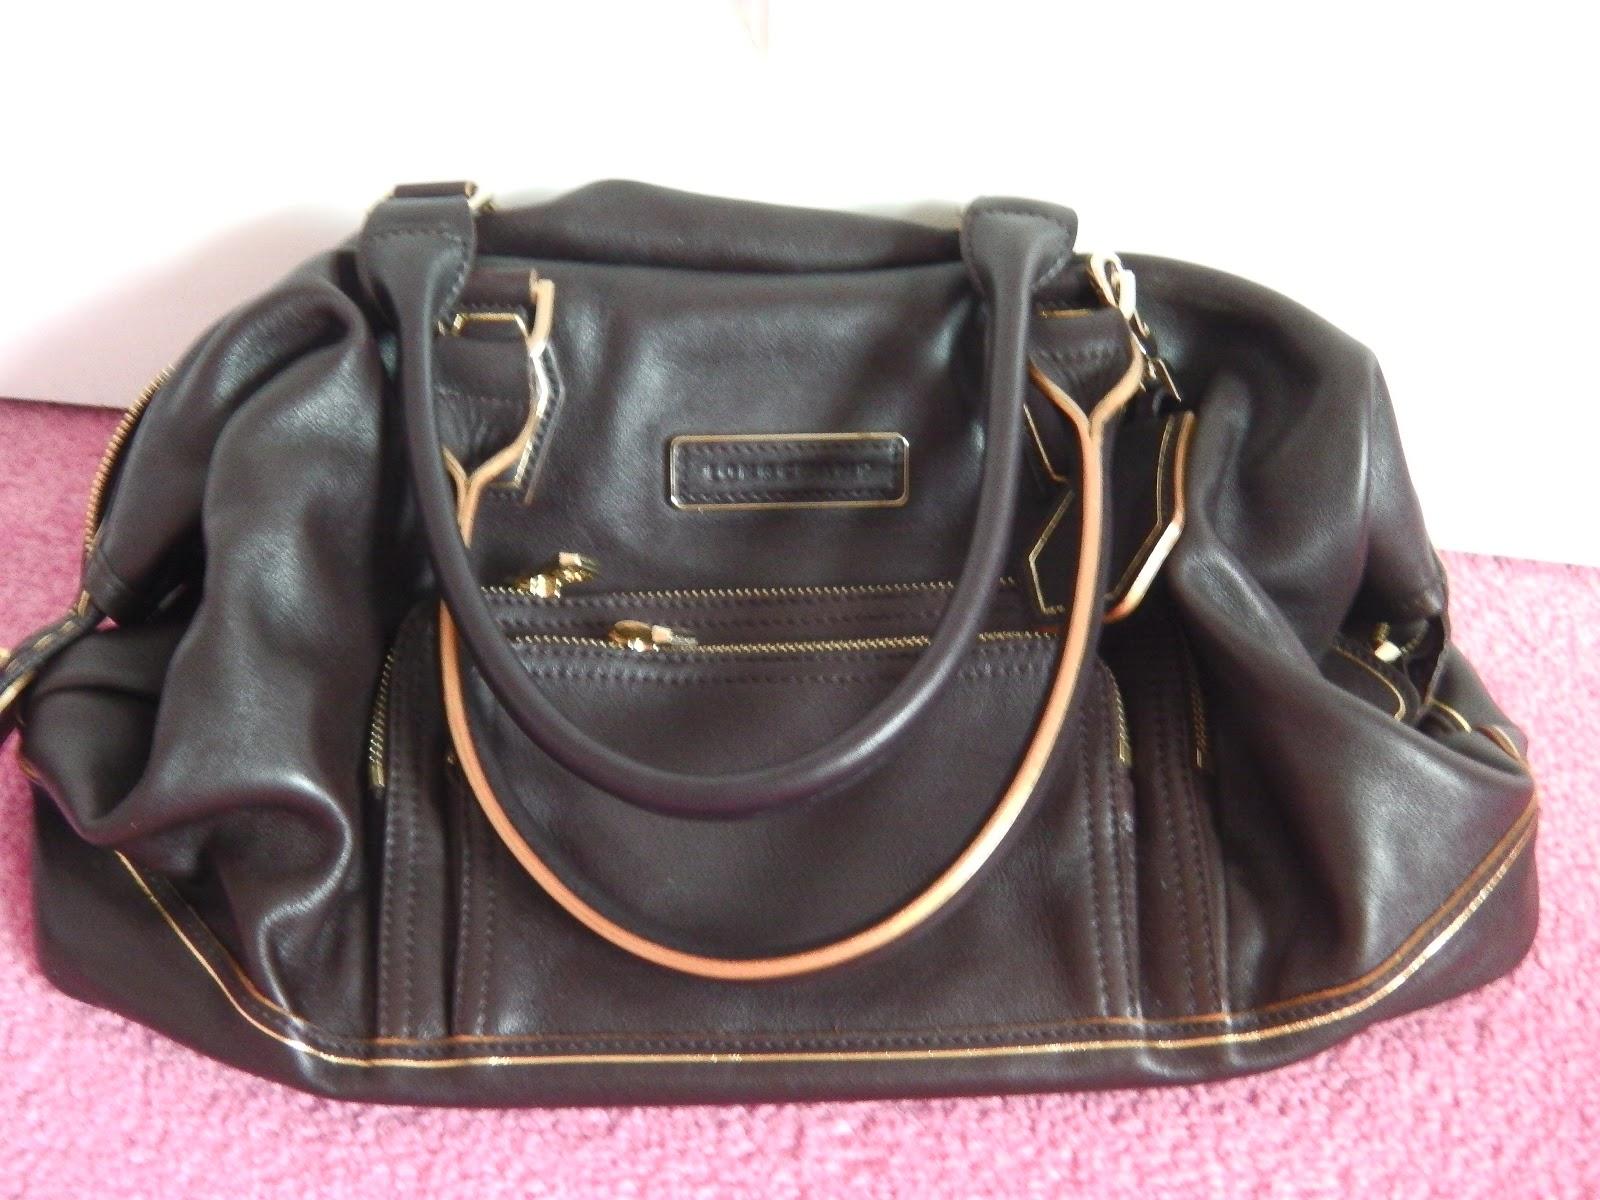 Longchamp Legende - Review  685e8391a5469